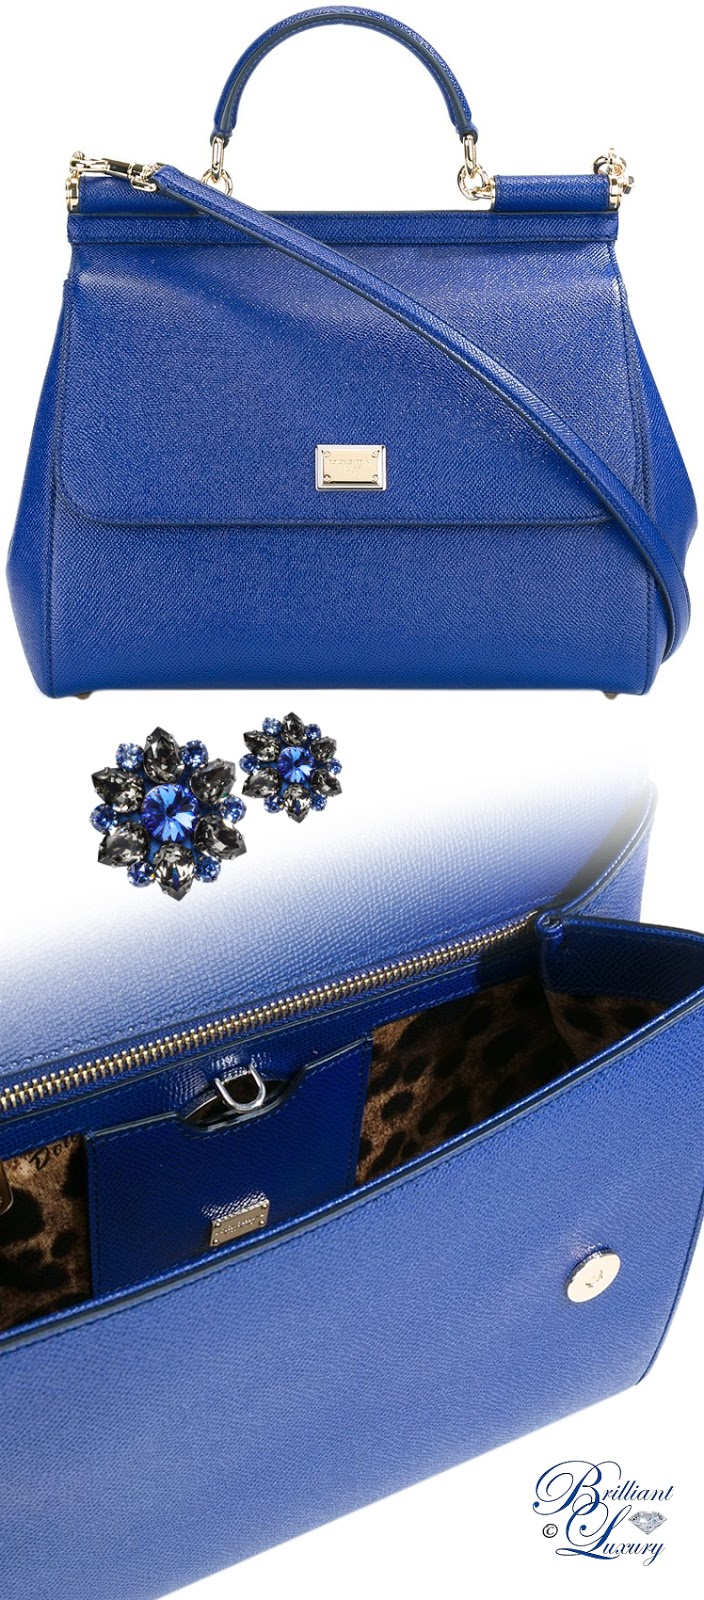 Brilliant Luxury ♦ Dolce & Gabbana Large Sicily Tote